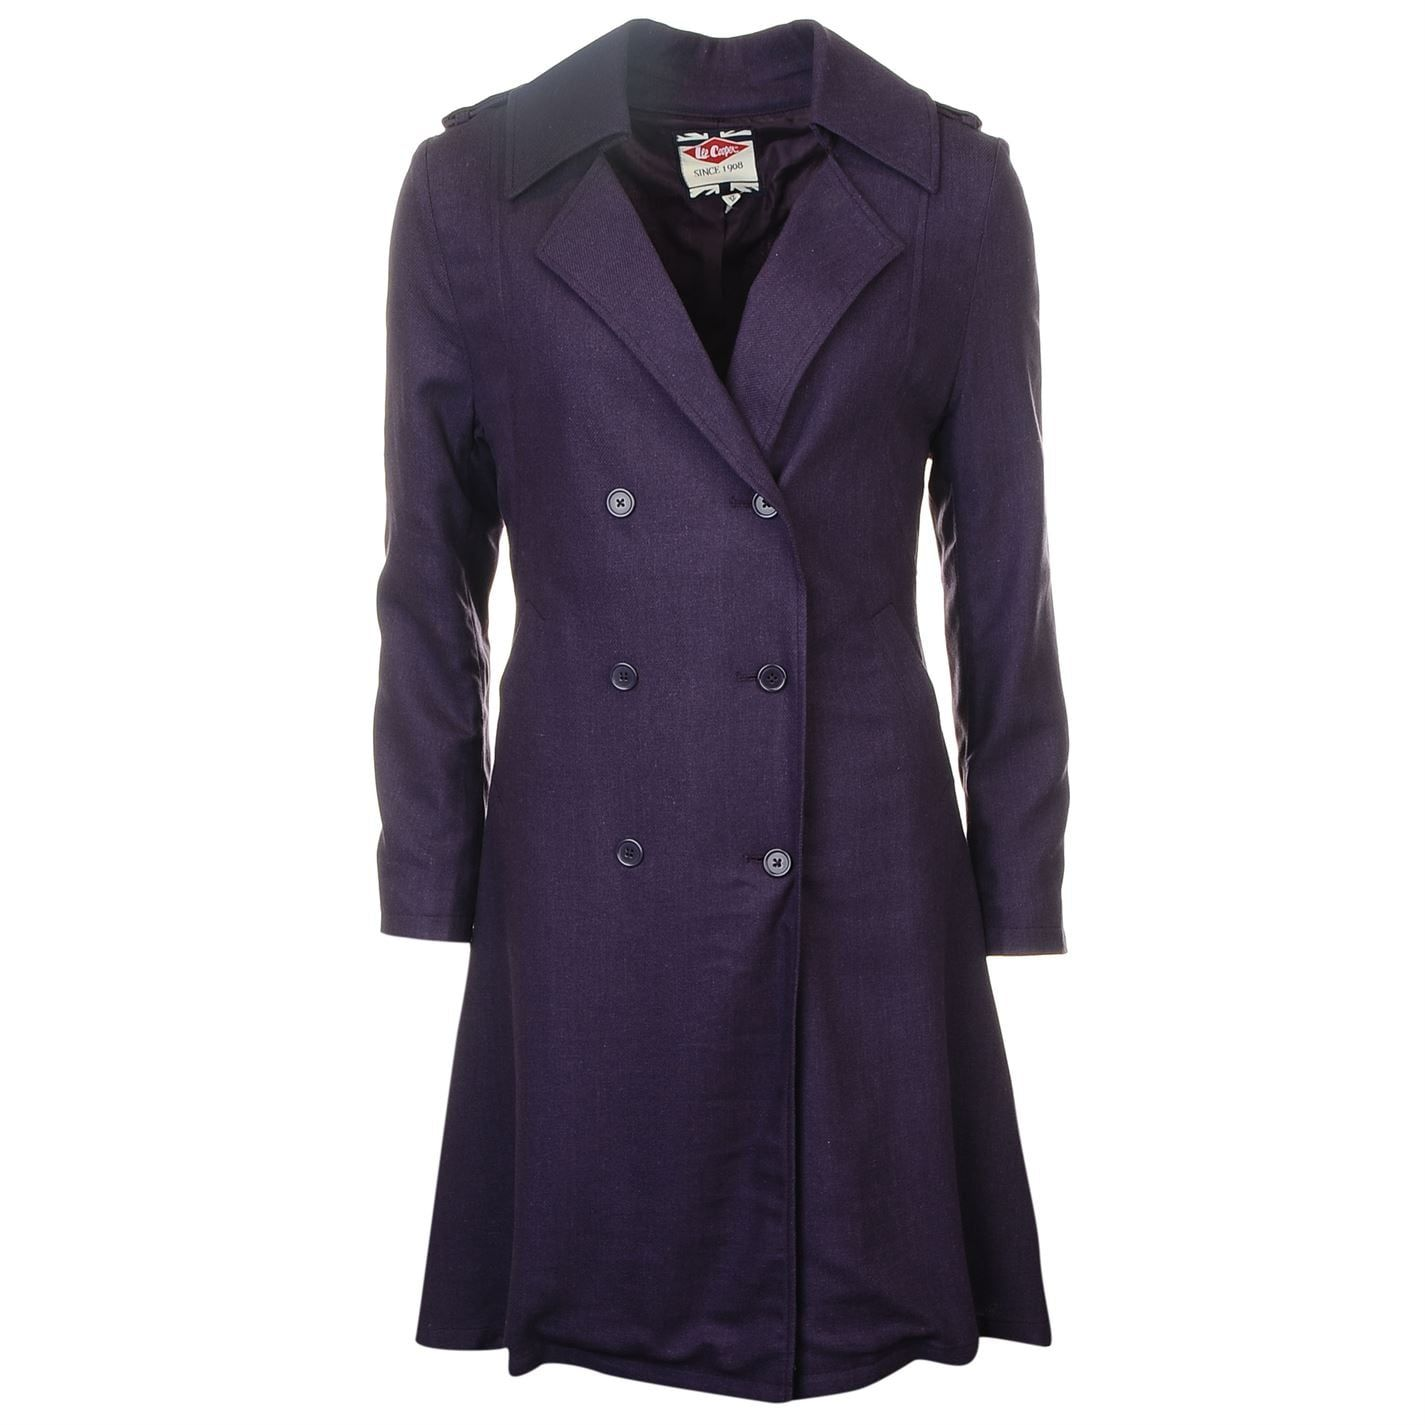 399a892ff6a Lee Cooper - Γυναικείο παλτό (669252-66925297) - Woomie.gr